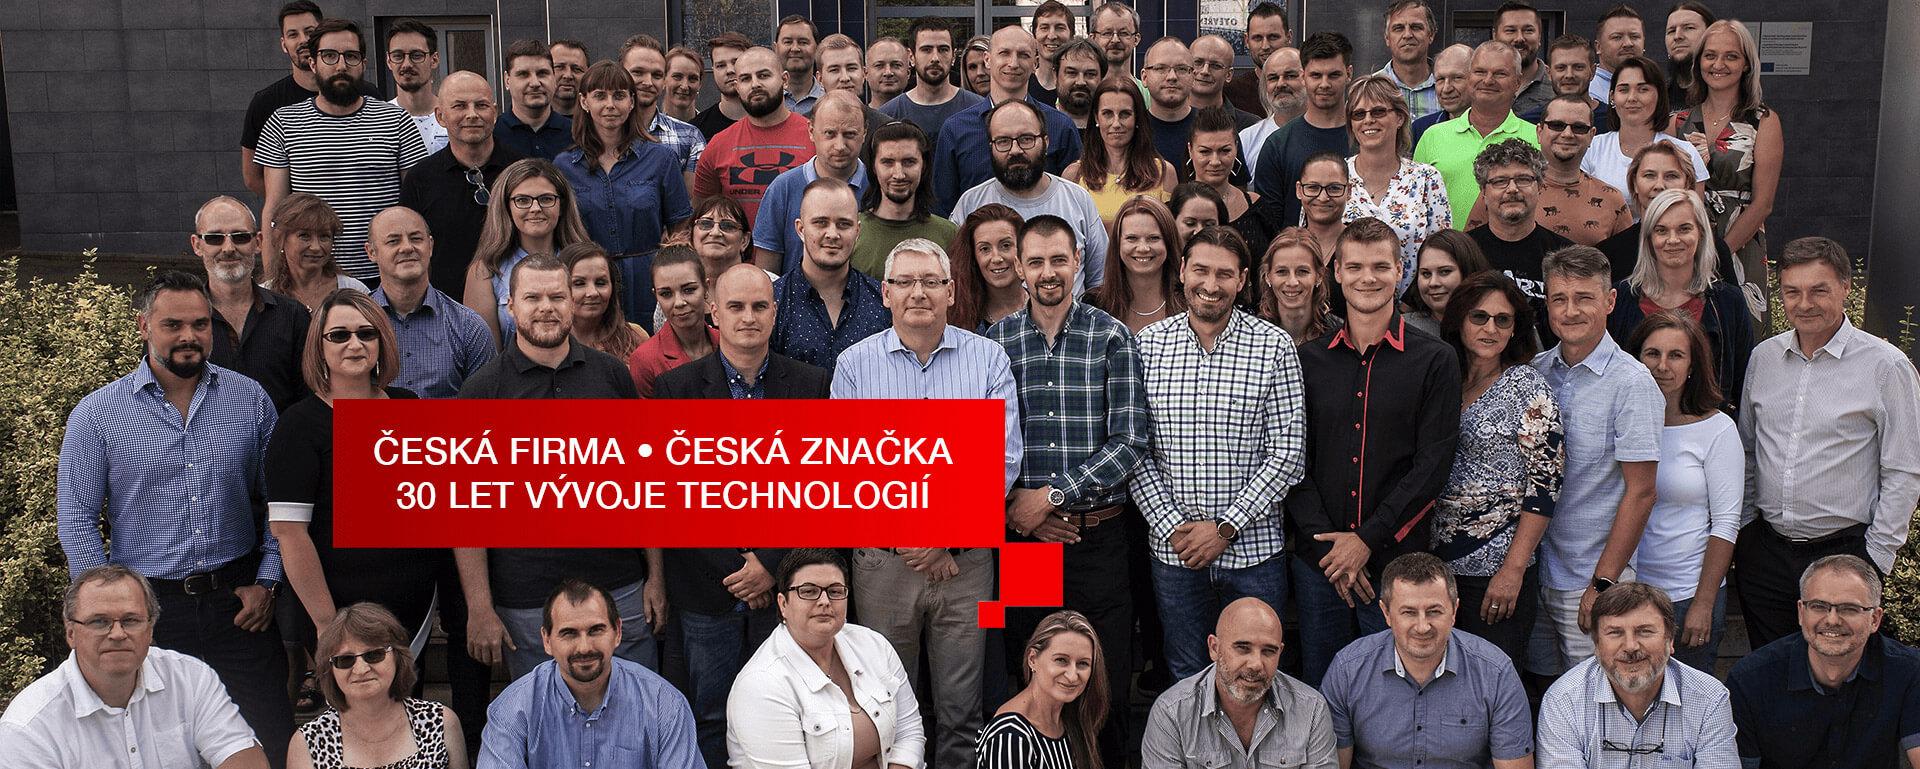 Onisystem team